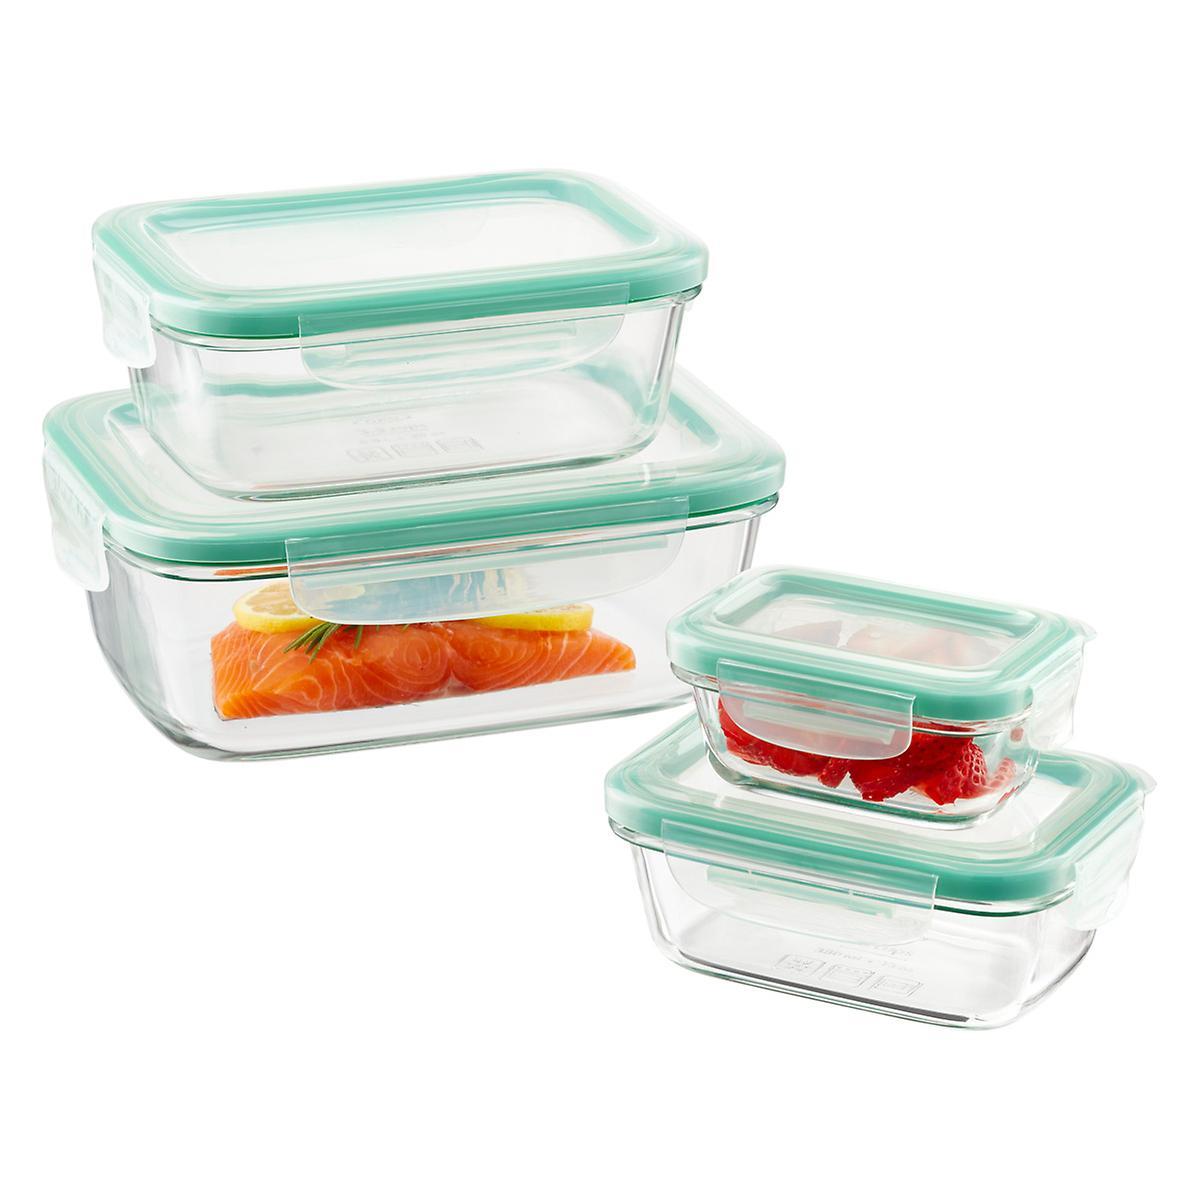 Oxo Good Grips 8 Piece Smart Seal Rectangular Glass Food Storage Set